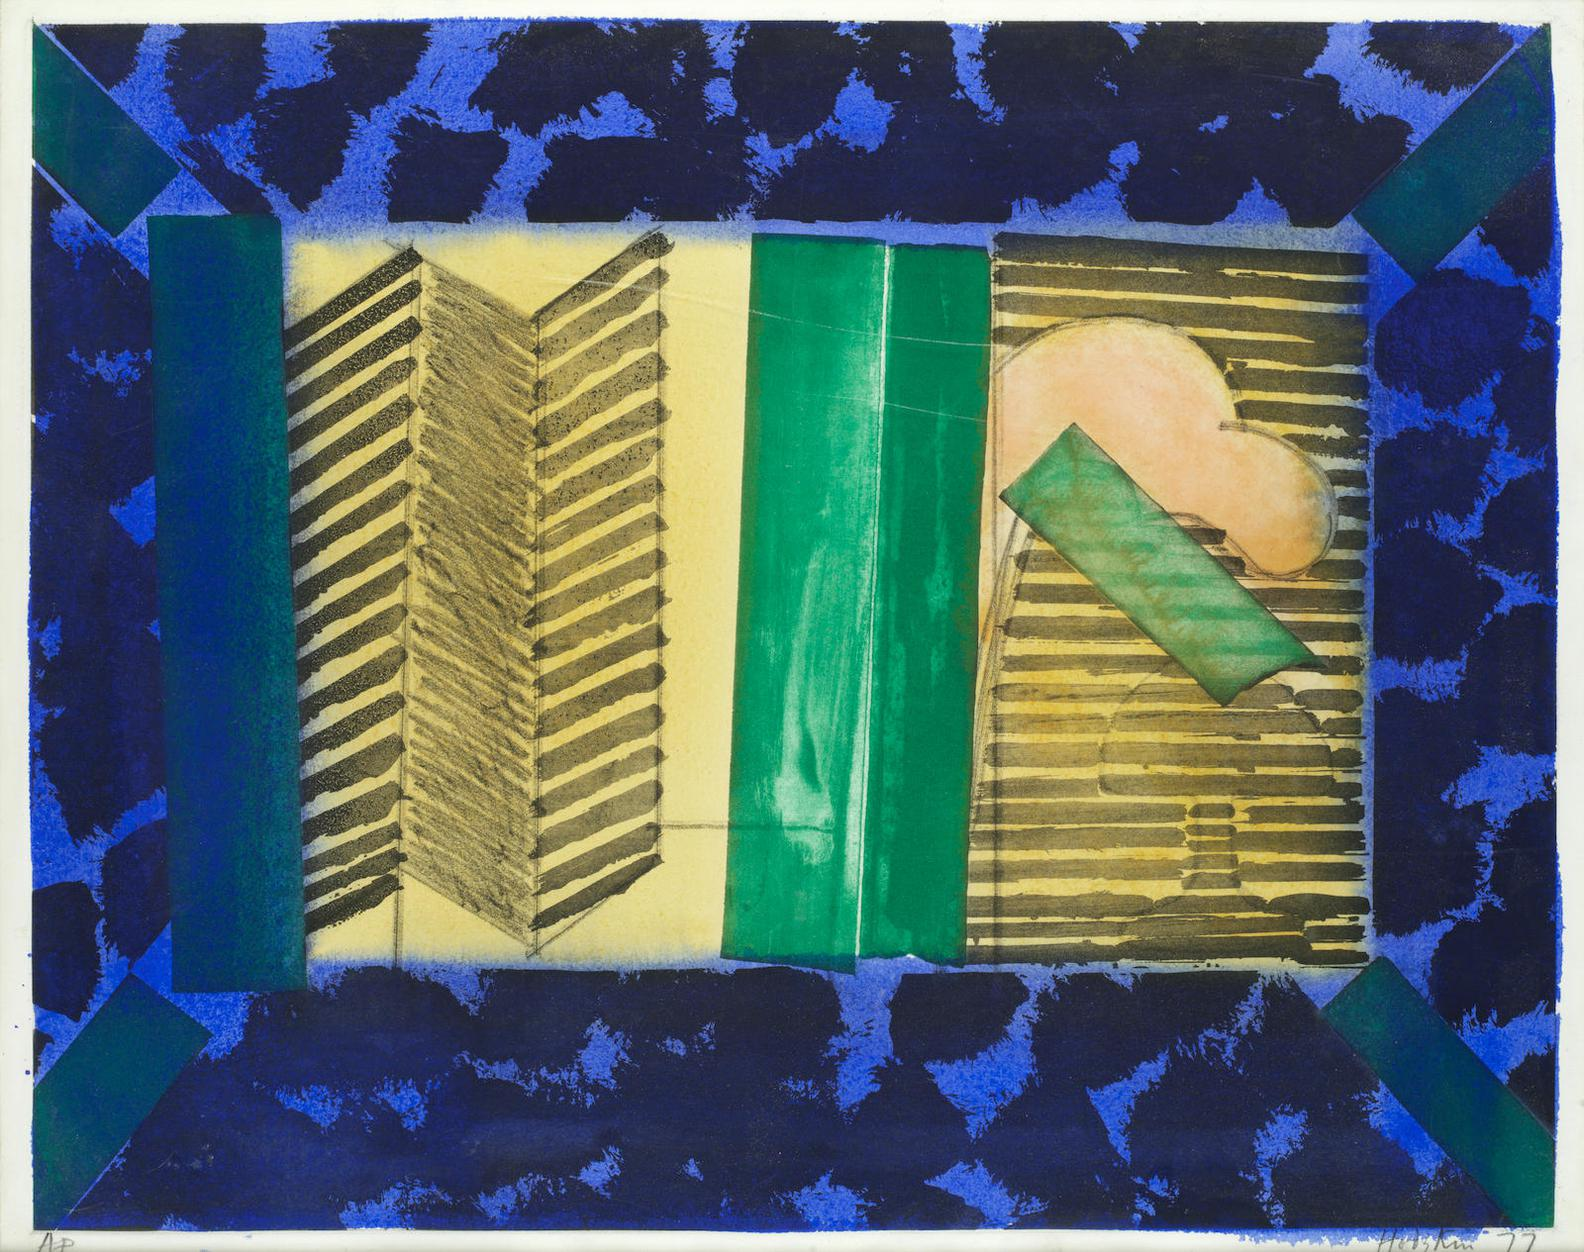 Howard Hodgkin-Nick-1977